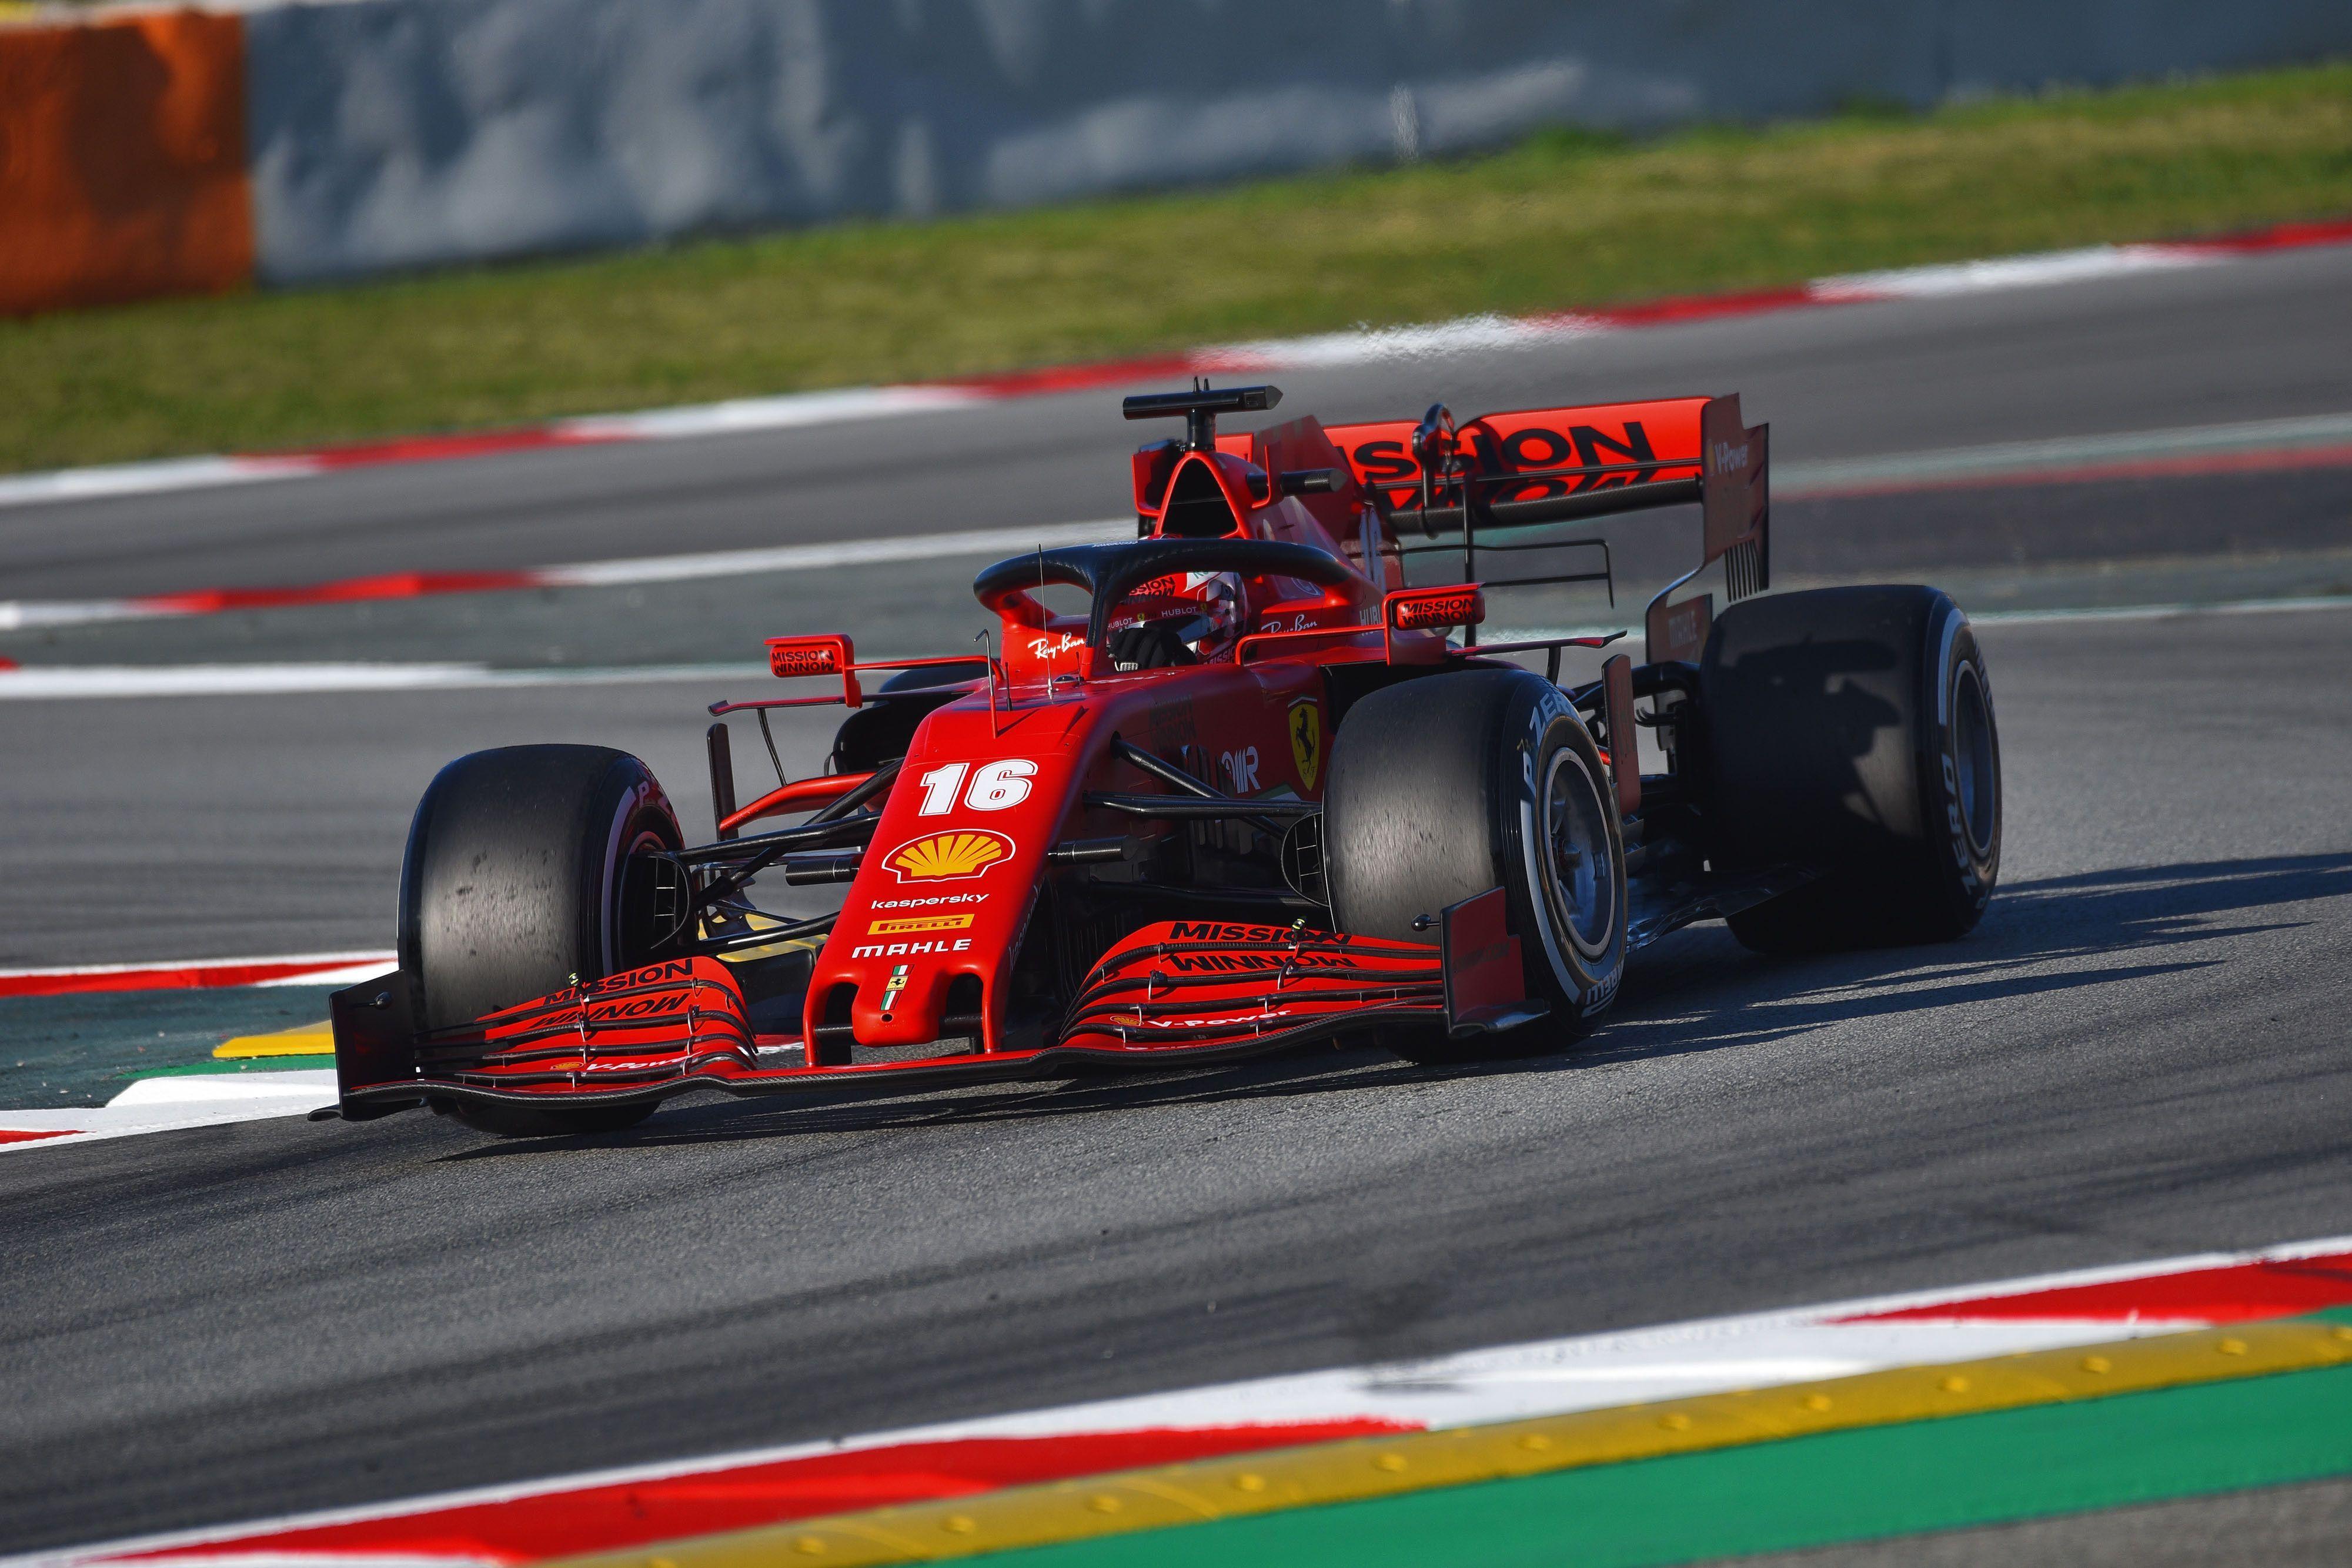 Leclerc Says Ferrari Sf1000 Quicker Around Corners For F1 2020 Than 2019